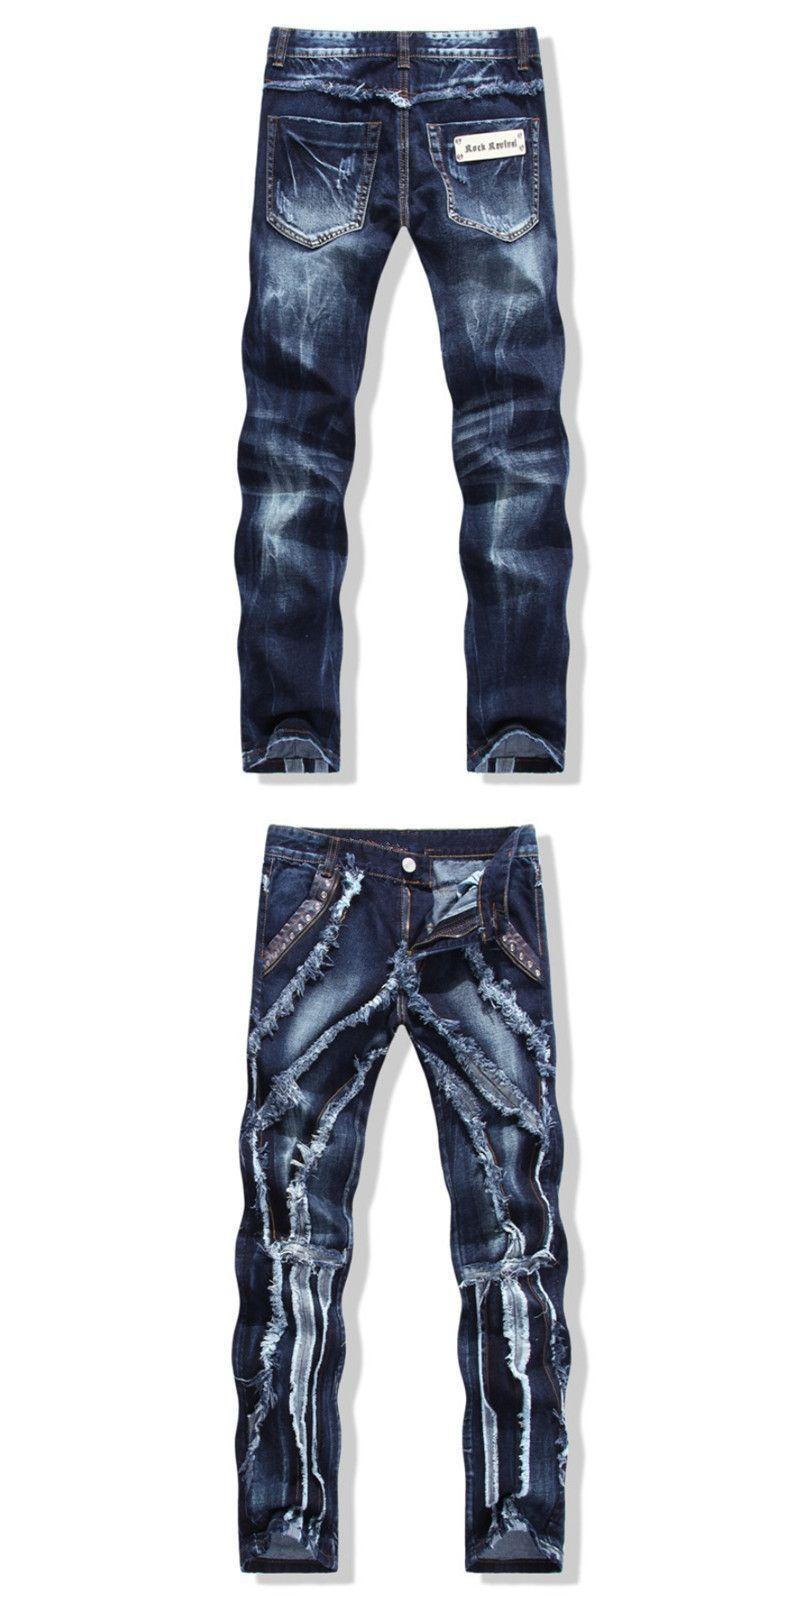 d0ef122387d European American Style NEW Men s jeans slim denim trousers biker men jeans  luxury ripped Straight blue punk slim jeans for men  slimjeansformen